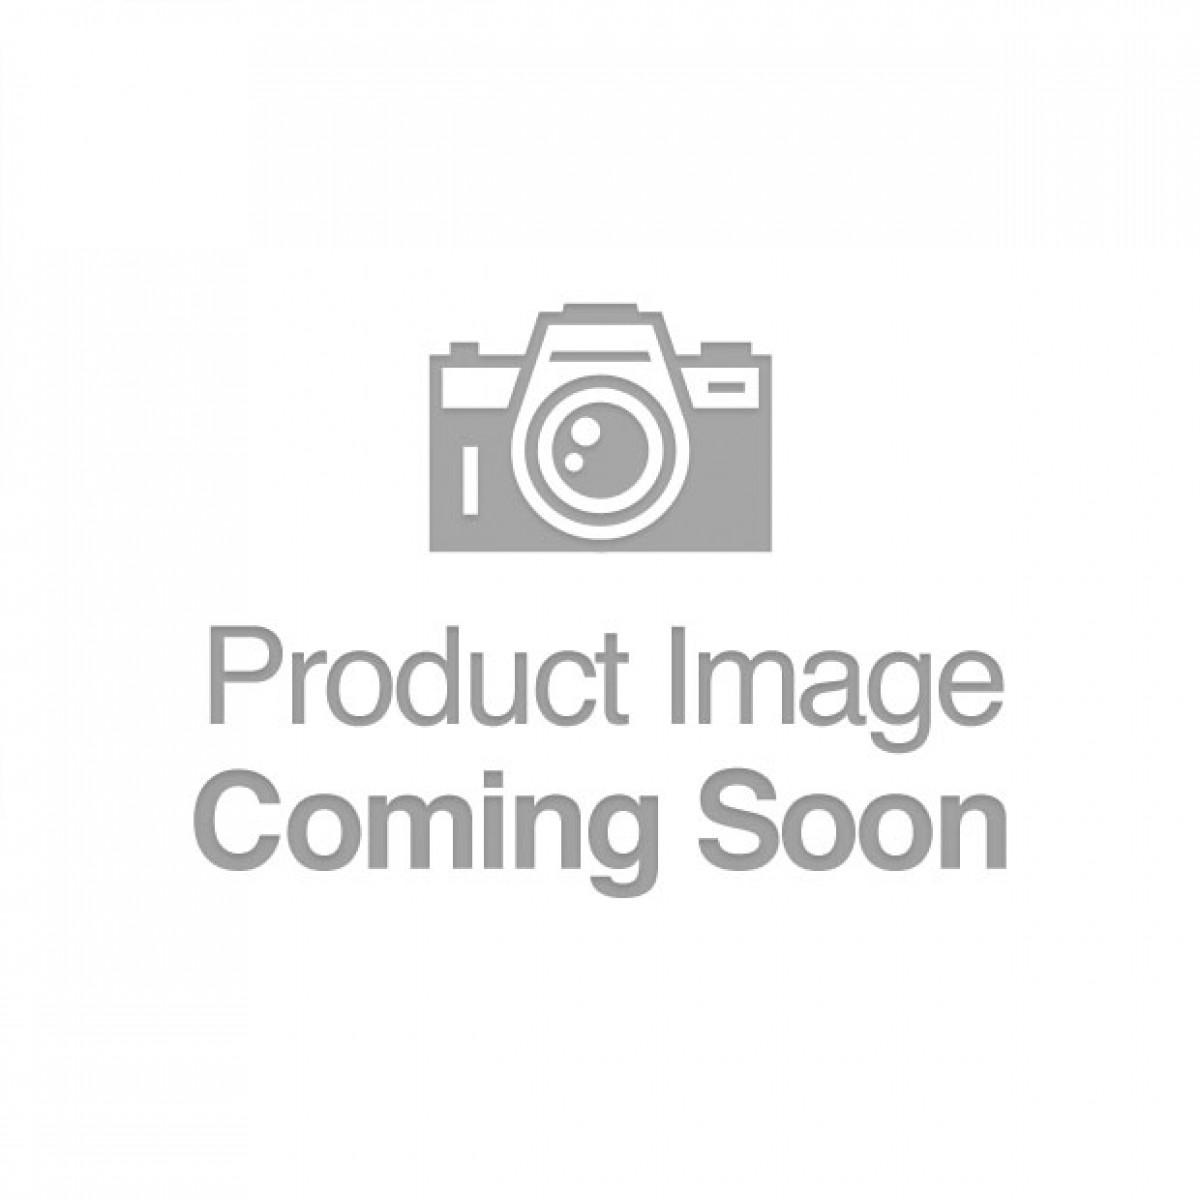 Kama Sutra Aromatic Oil - 8 Oz Pleasure Garden